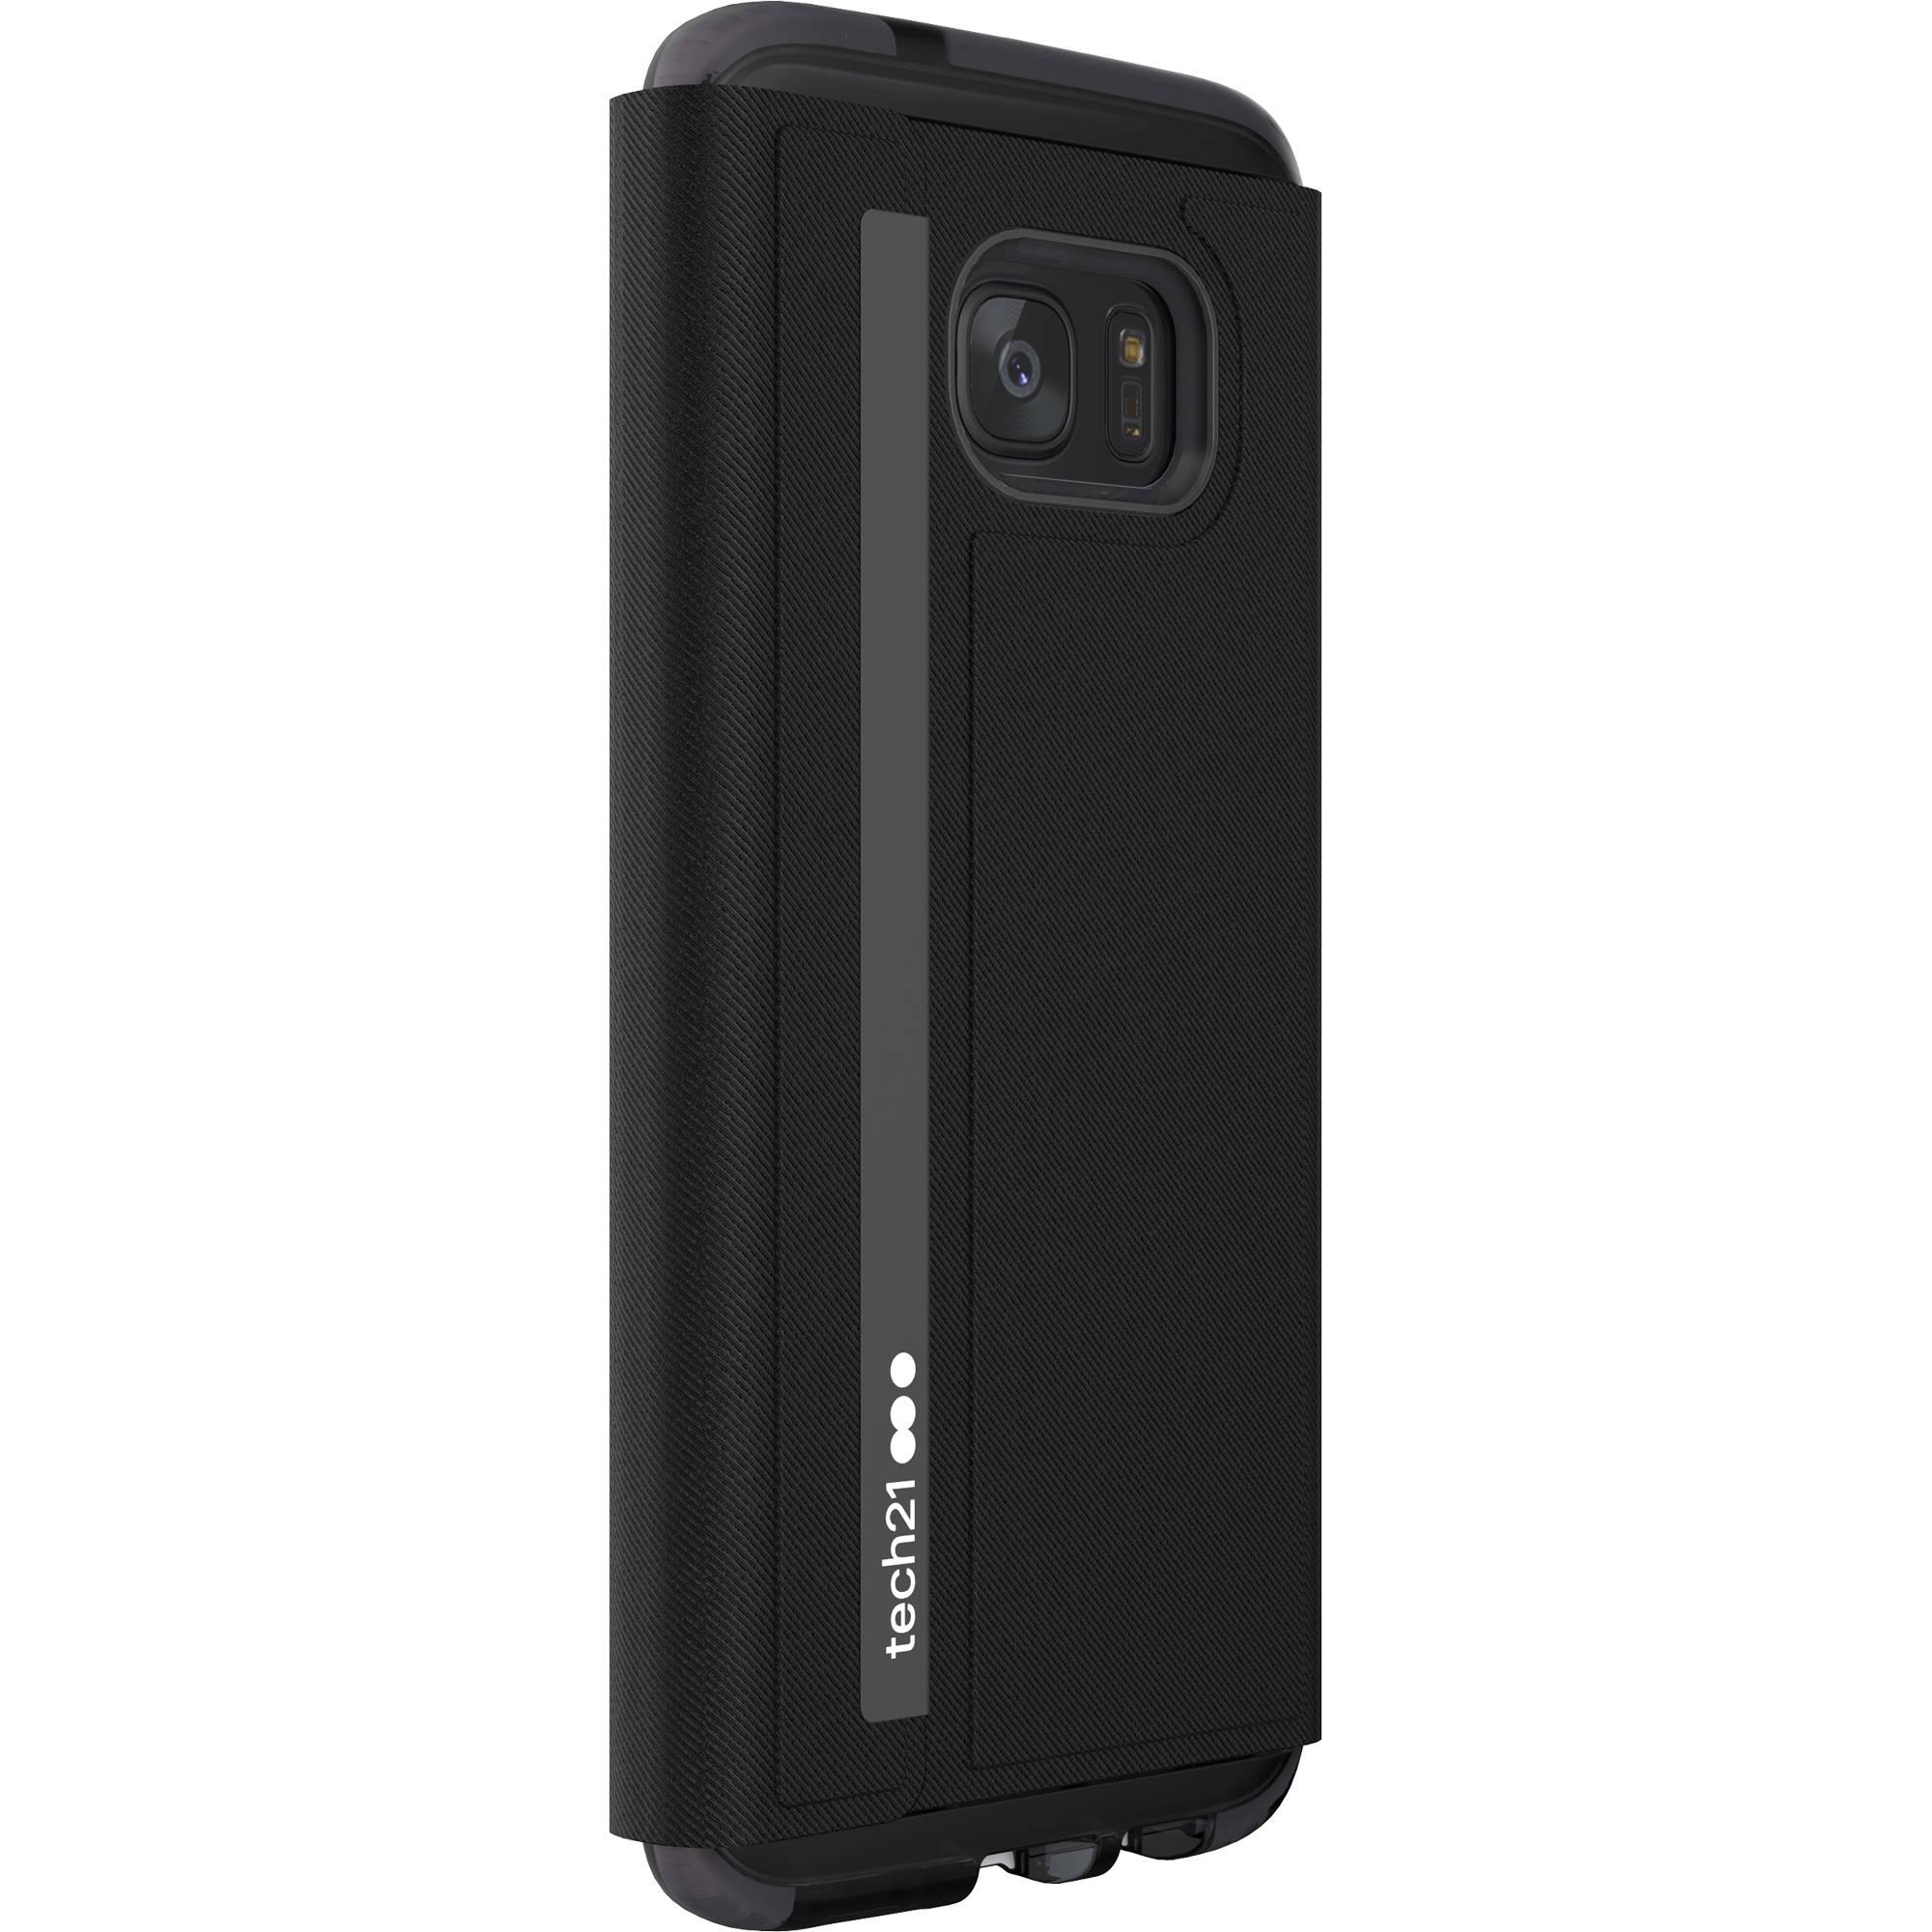 new product df4b5 935ef Tech21 Evo Wallet Case for Galaxy S7 edge (Black)